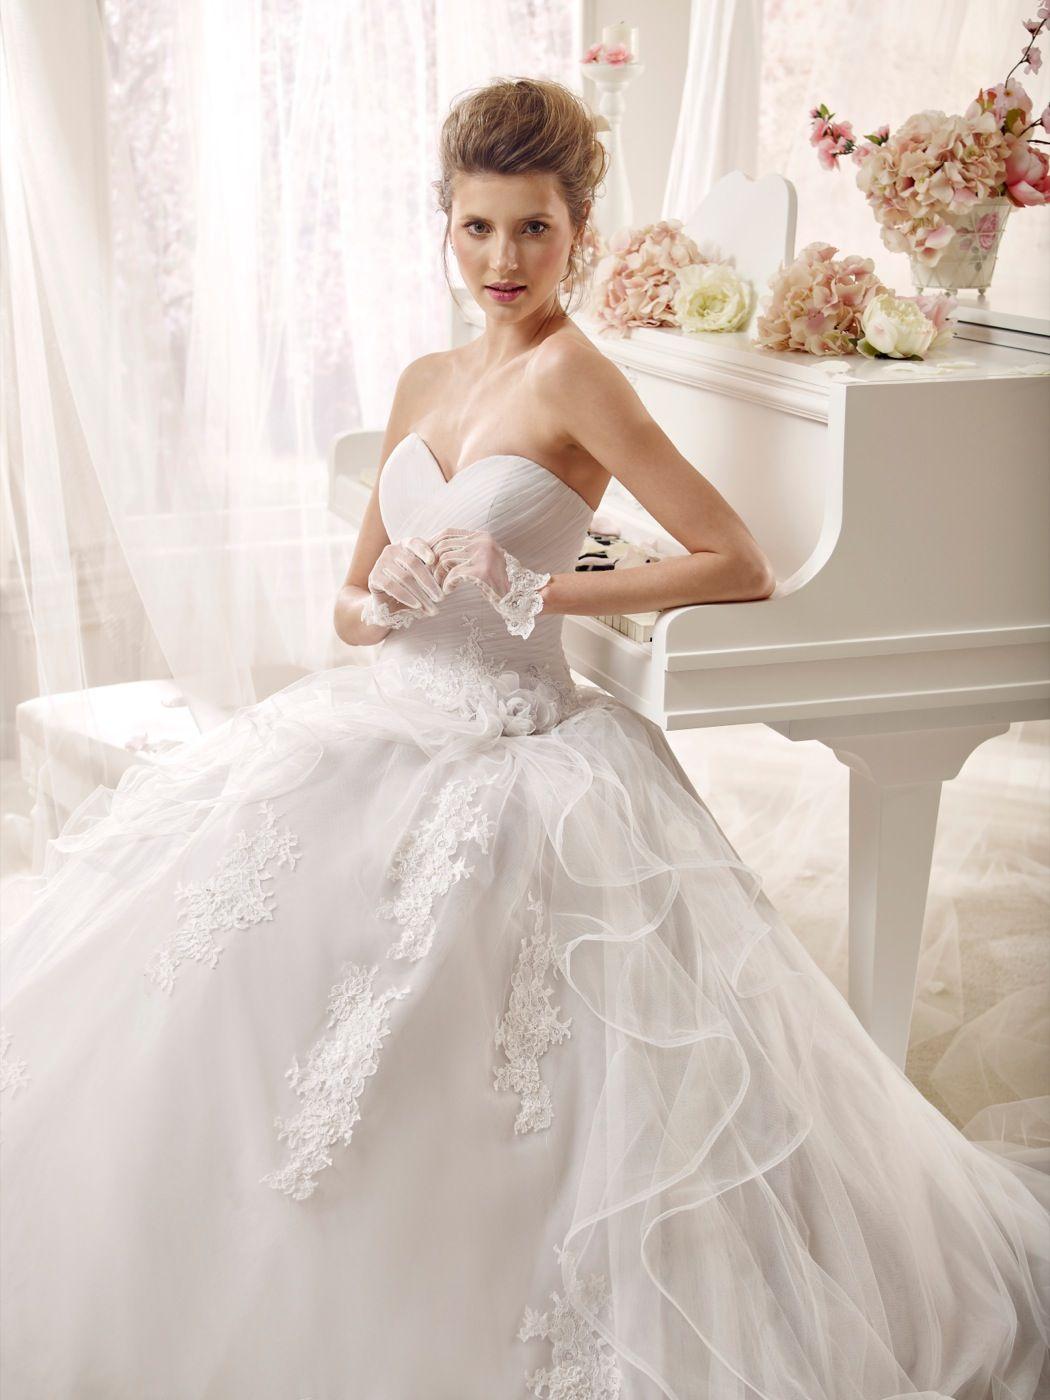 359fb735d052  wedding  weddingdress  2016  collection  bride  bridal  brides  fashion   love  white  sposa  abitodasposa  bianco  marriage  flowers